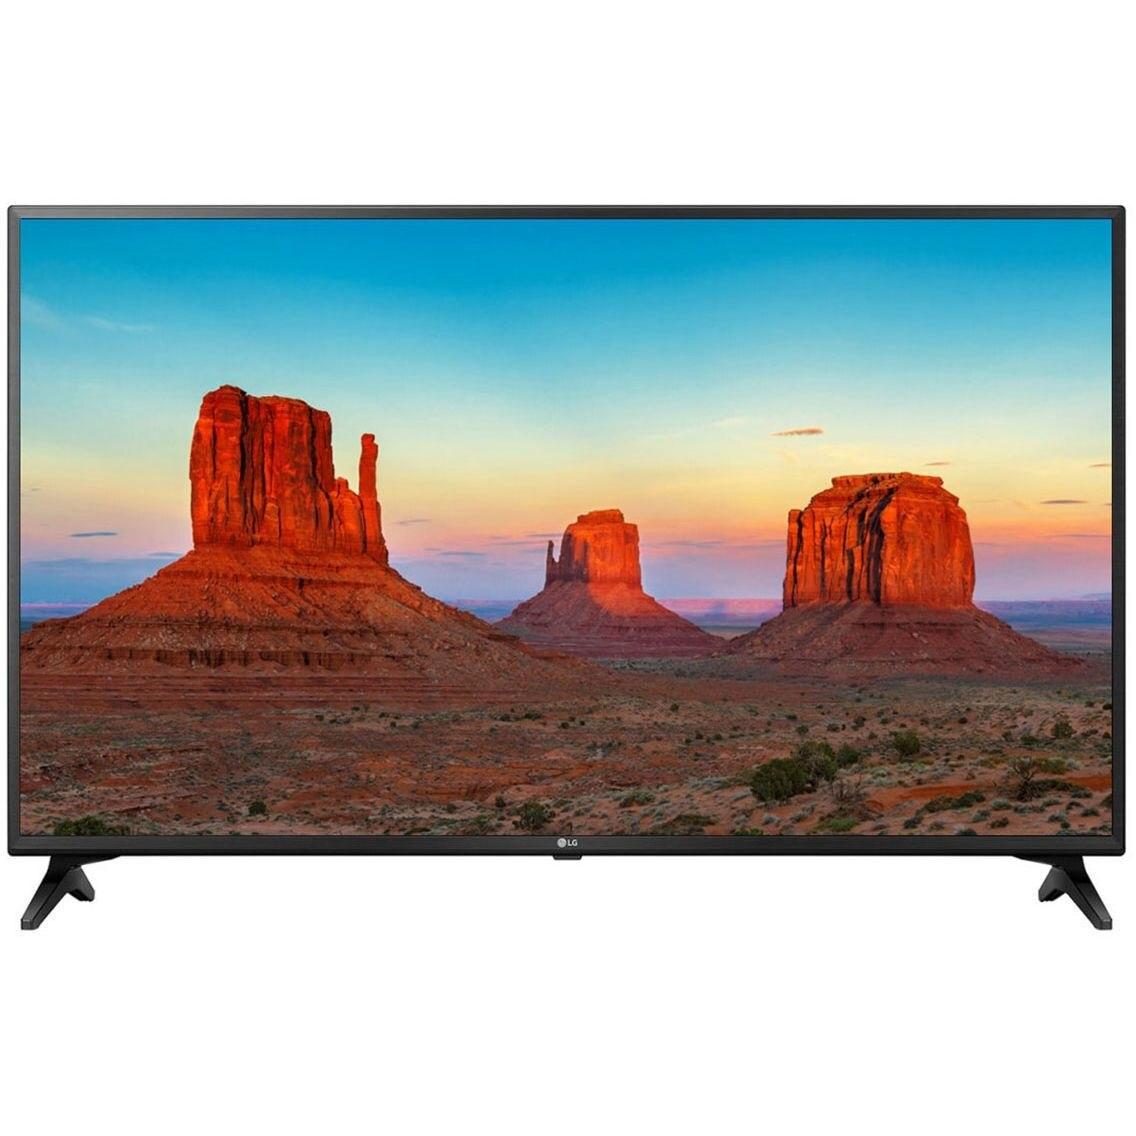 TV smart TV Android Apple TV TV LG 43 polegada 4K IPS LCD Ultra UHD Resolucion 3840x2160 HDR WiFi DVB-T2C frete grátis